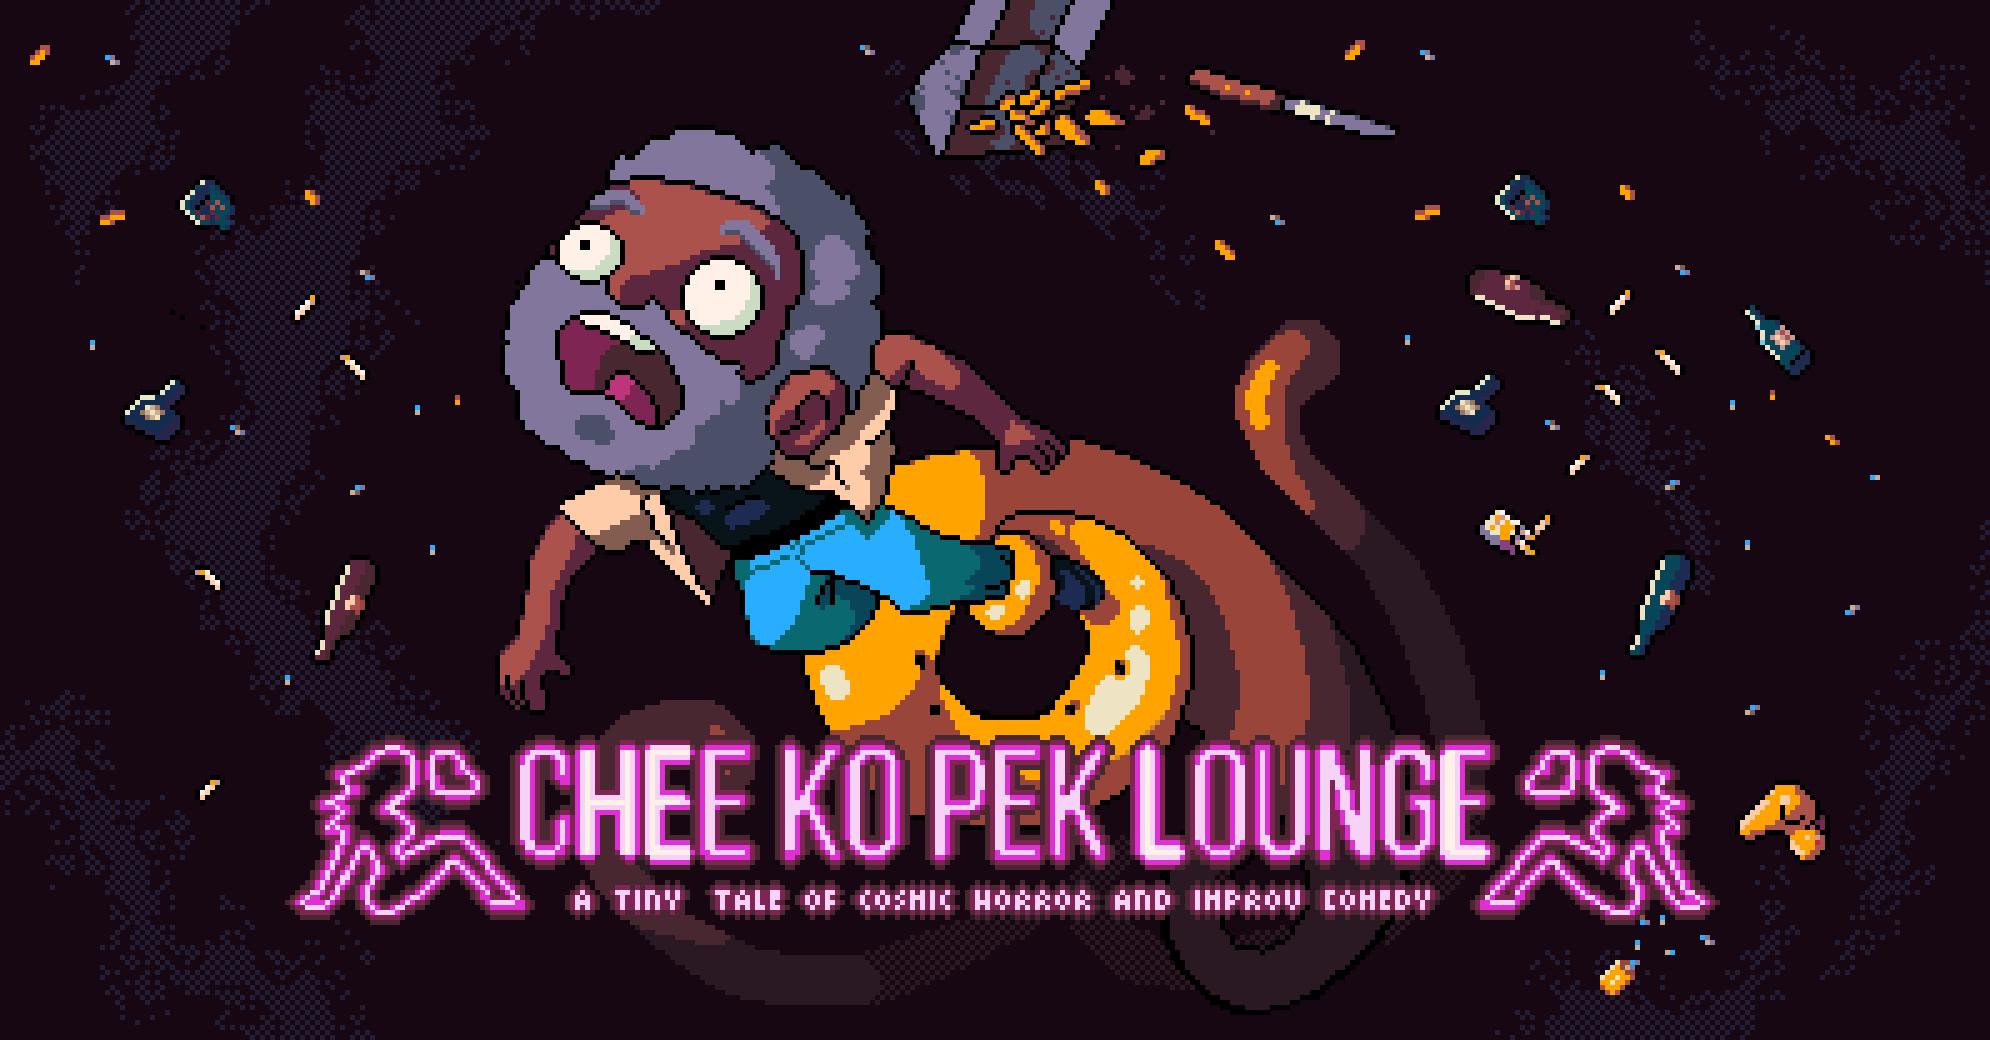 Chee Ko Pek Lounge